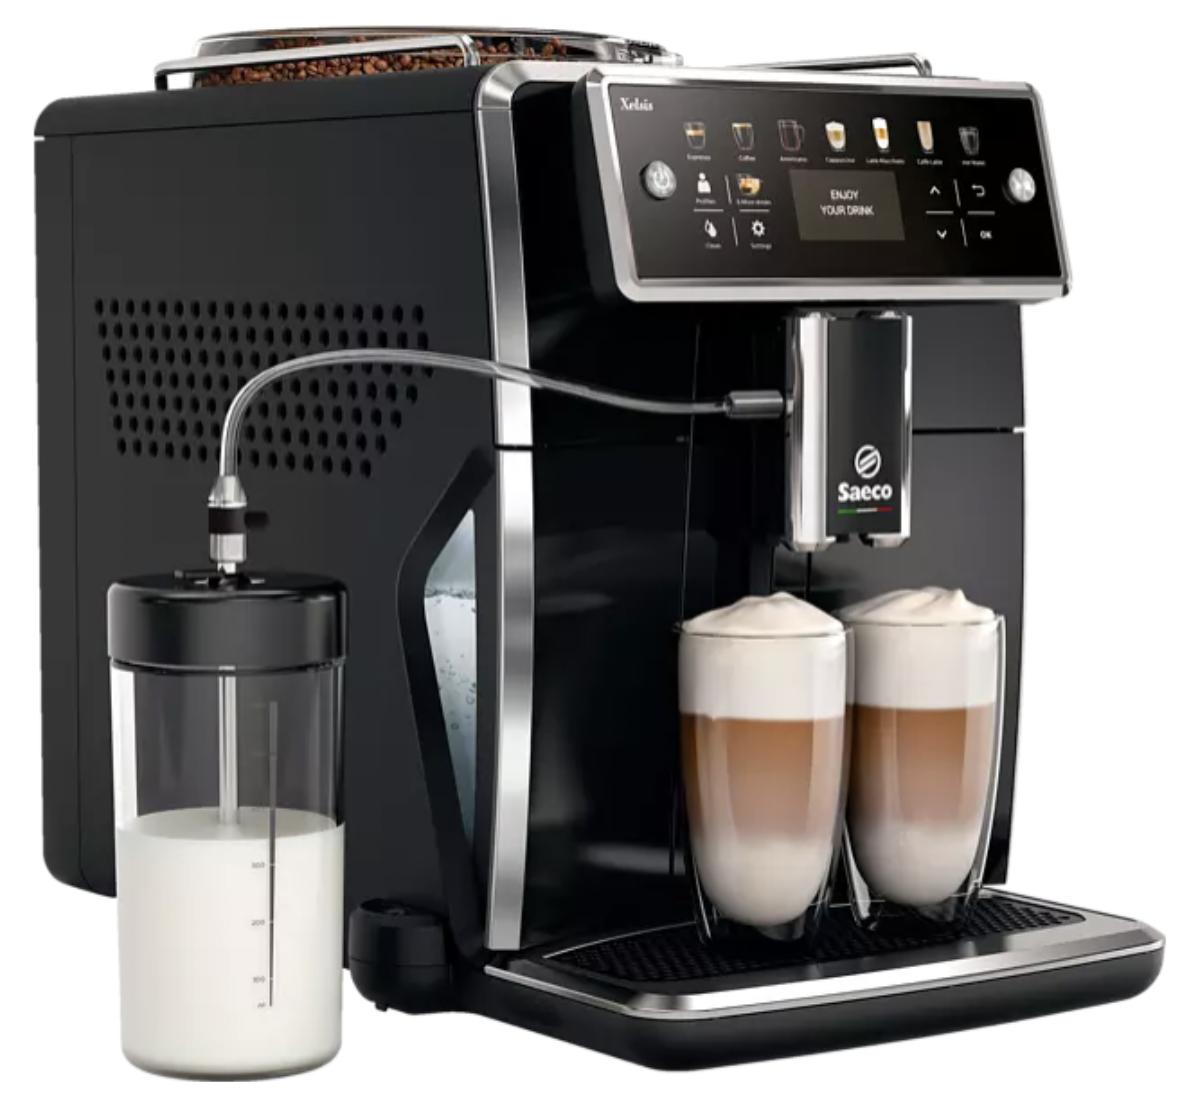 SAECO SM 7580/00 Xelsis Kaffeevollautomat für 789€ inkl. Versand (statt 880€)